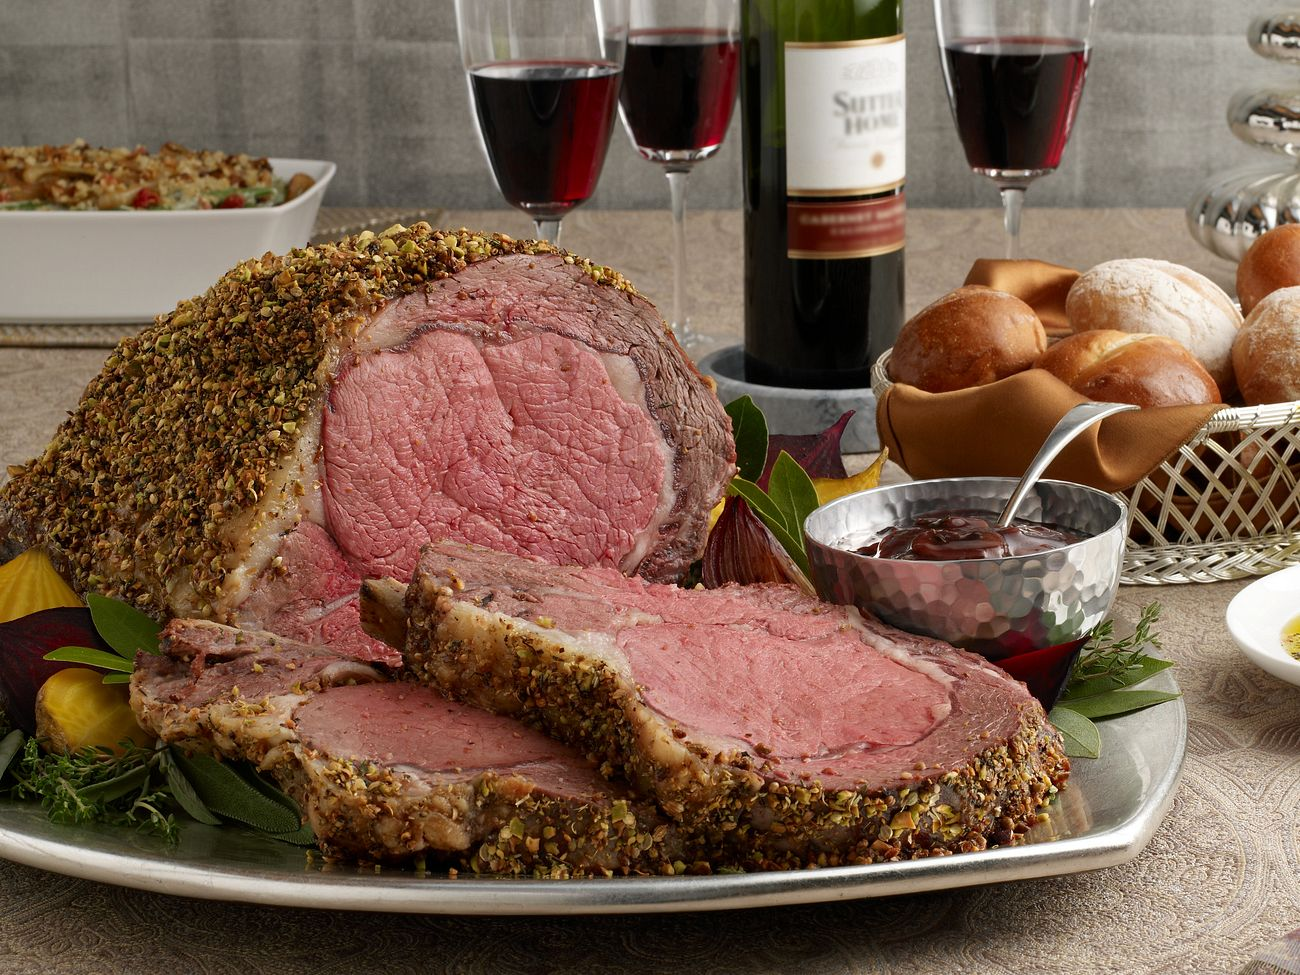 pistachio-crusted-ribeye-roast-with-holiday-wine-sauce-horizontal